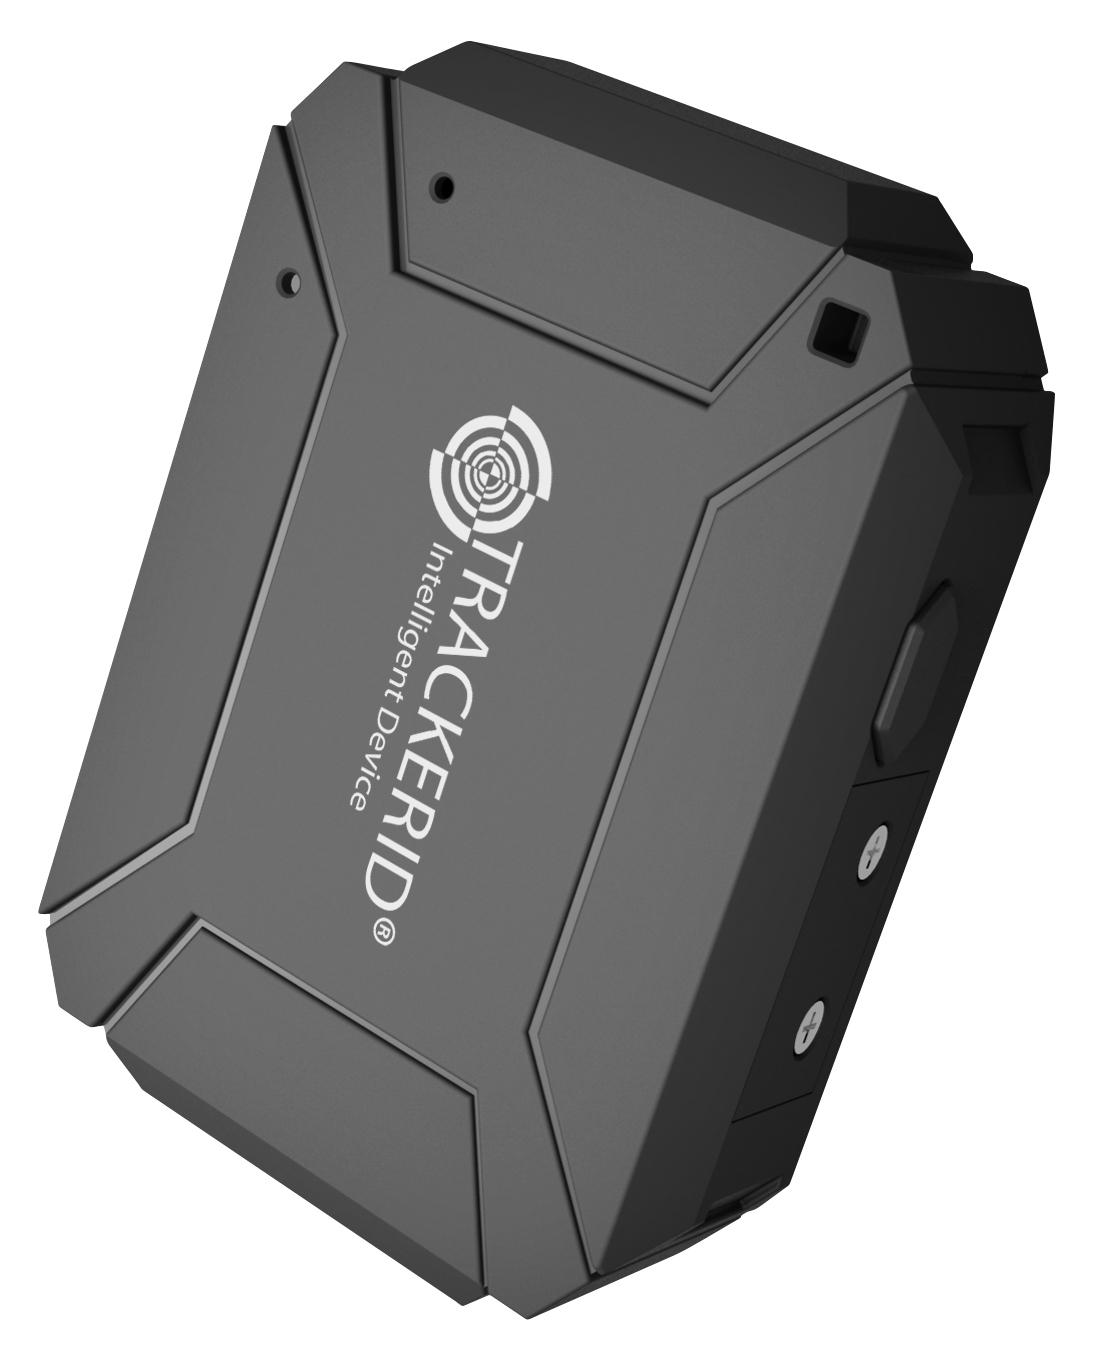 trackerid gps gsm tracker lts 200 live tracking app. Black Bedroom Furniture Sets. Home Design Ideas